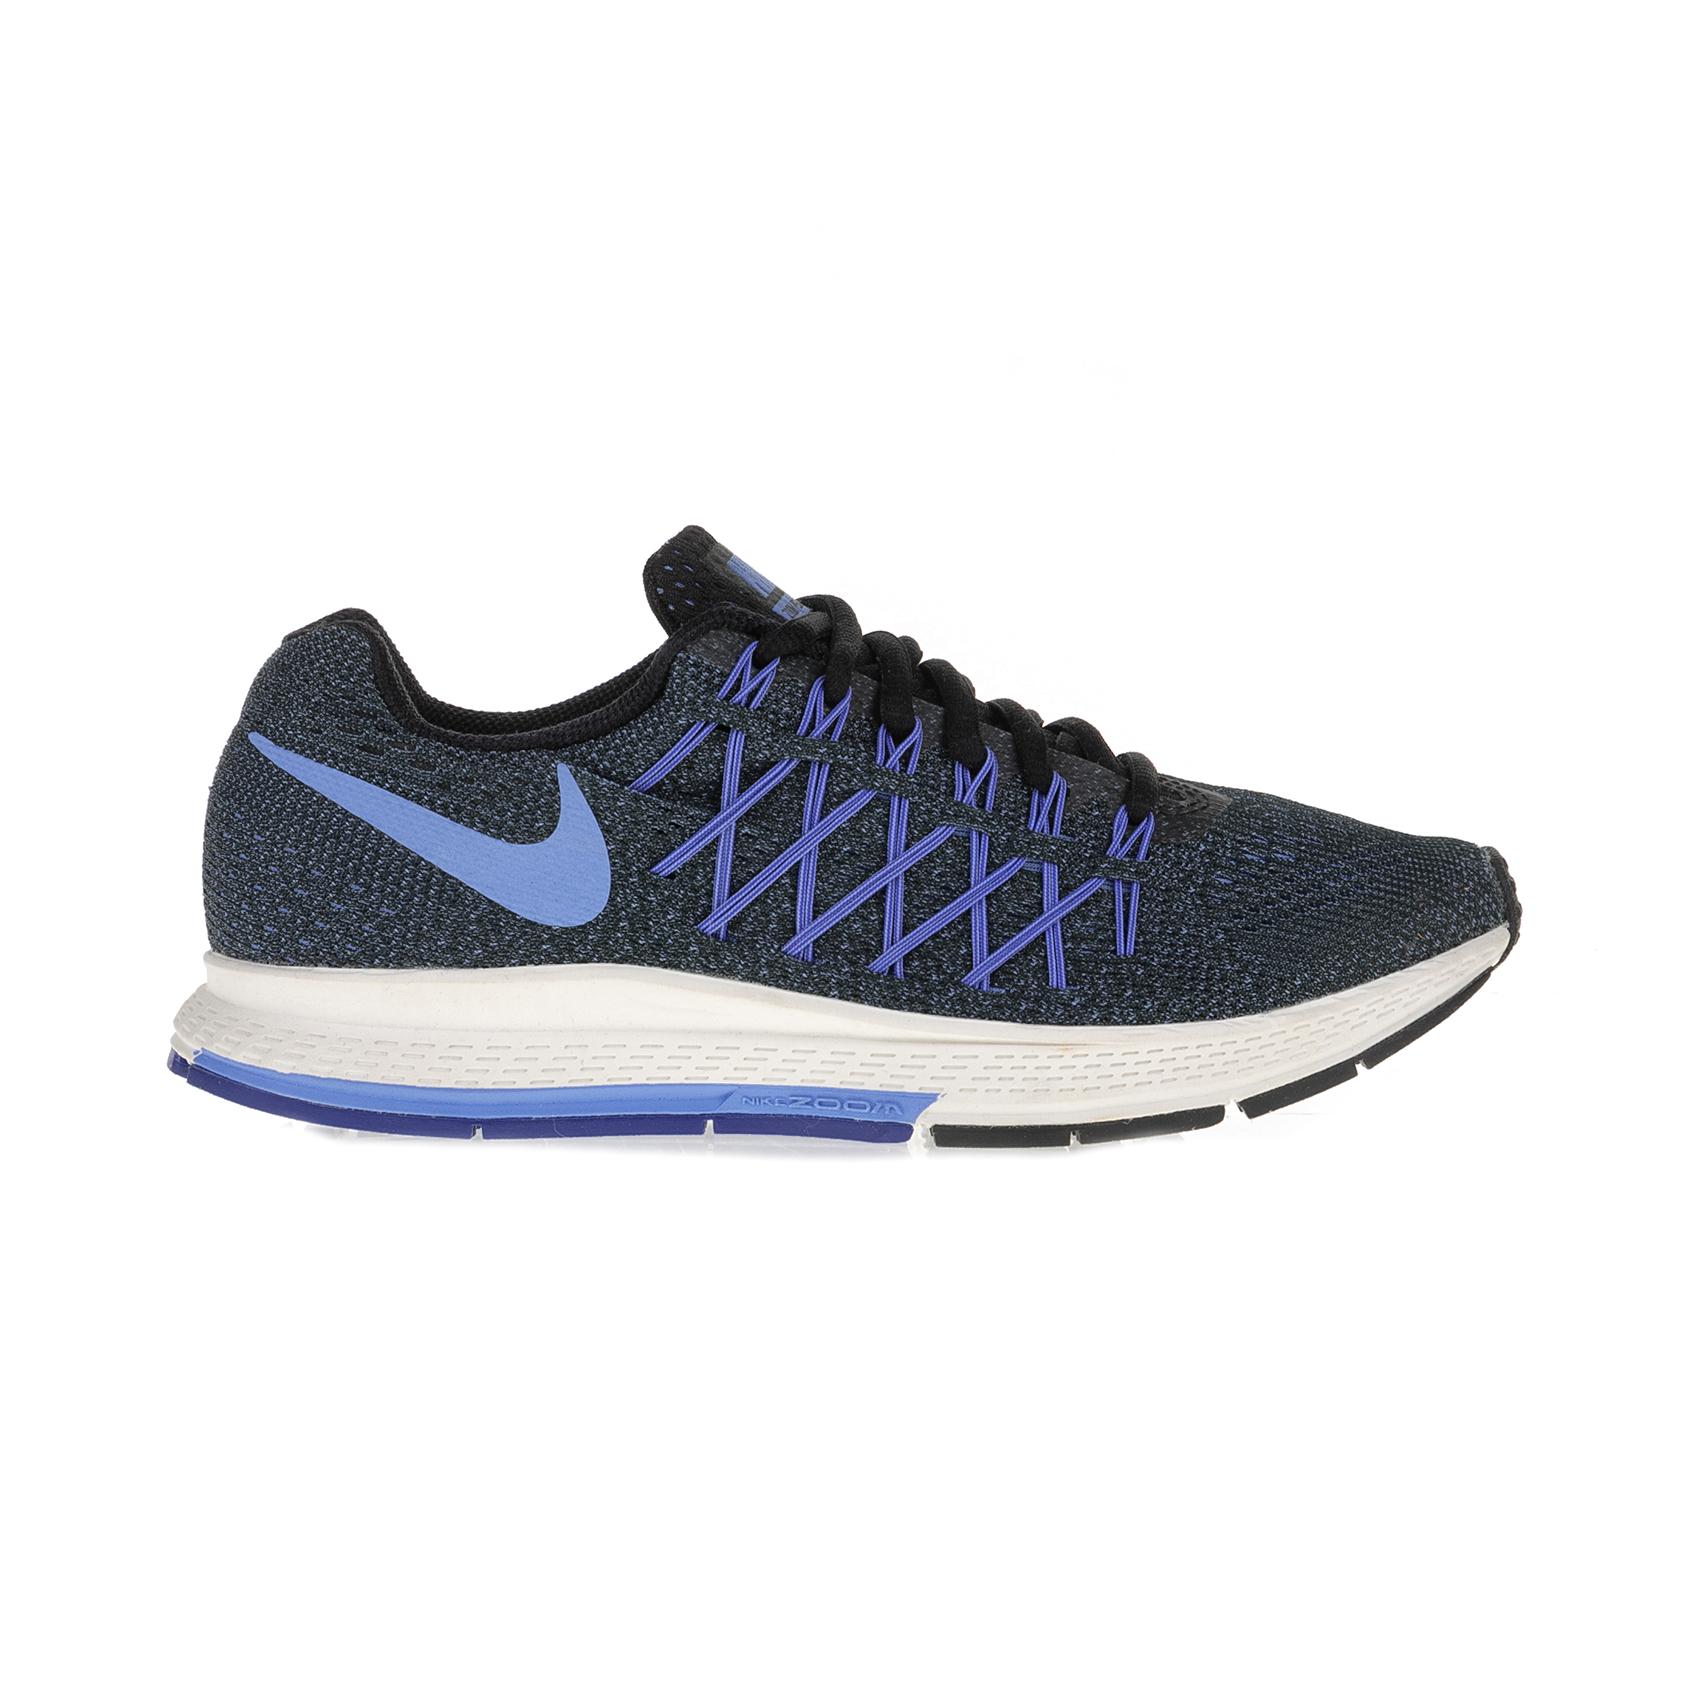 NIKE – Γυναικεία αθλητικά παπούτσια Nike AIR ZOOM PEGASUS 32 μπλε